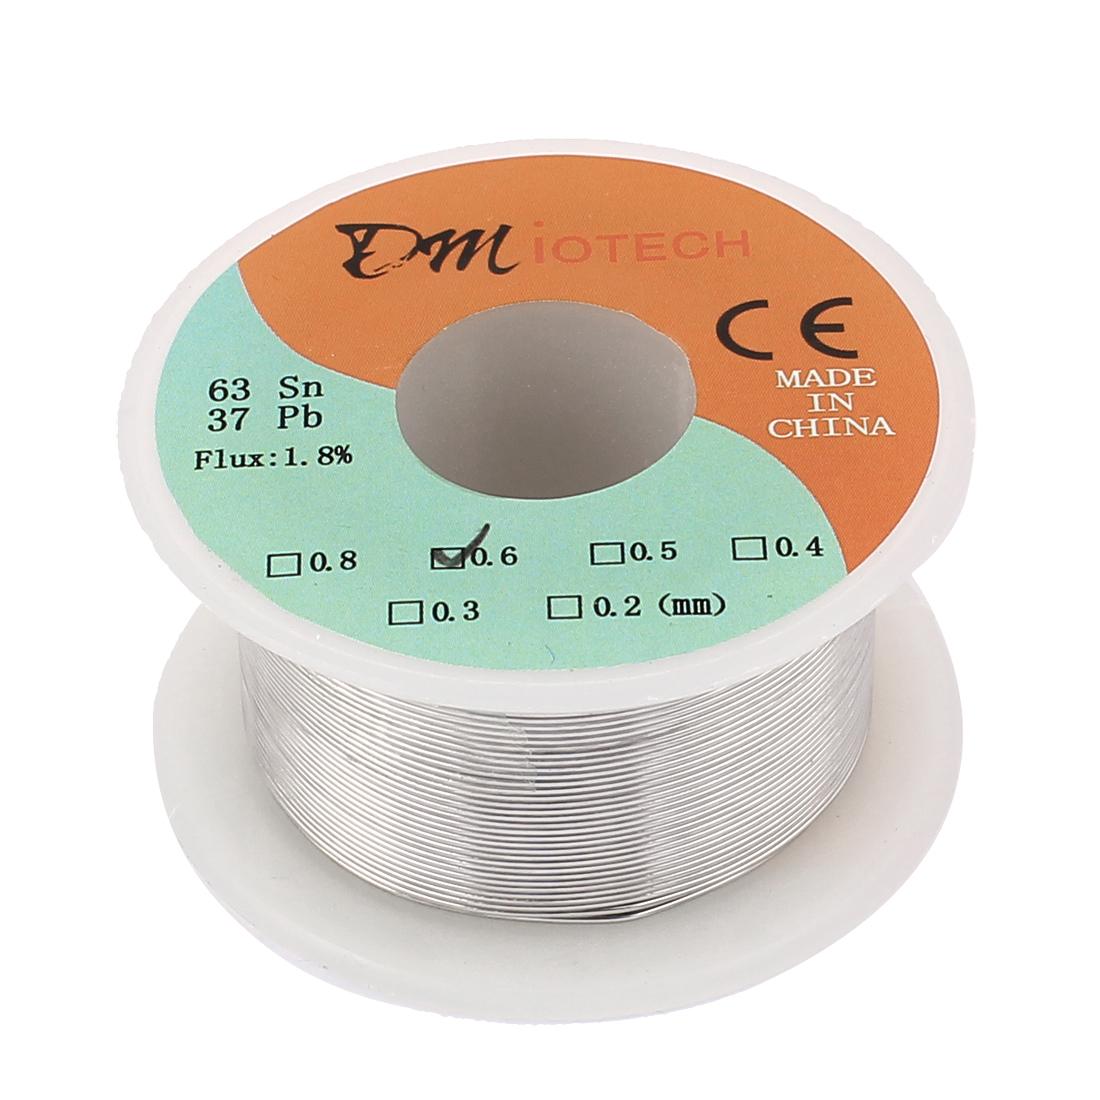 DMiotech 0.6mm 50g 63/37 Tin  Roll Soldering Solder Wire Reel Spool